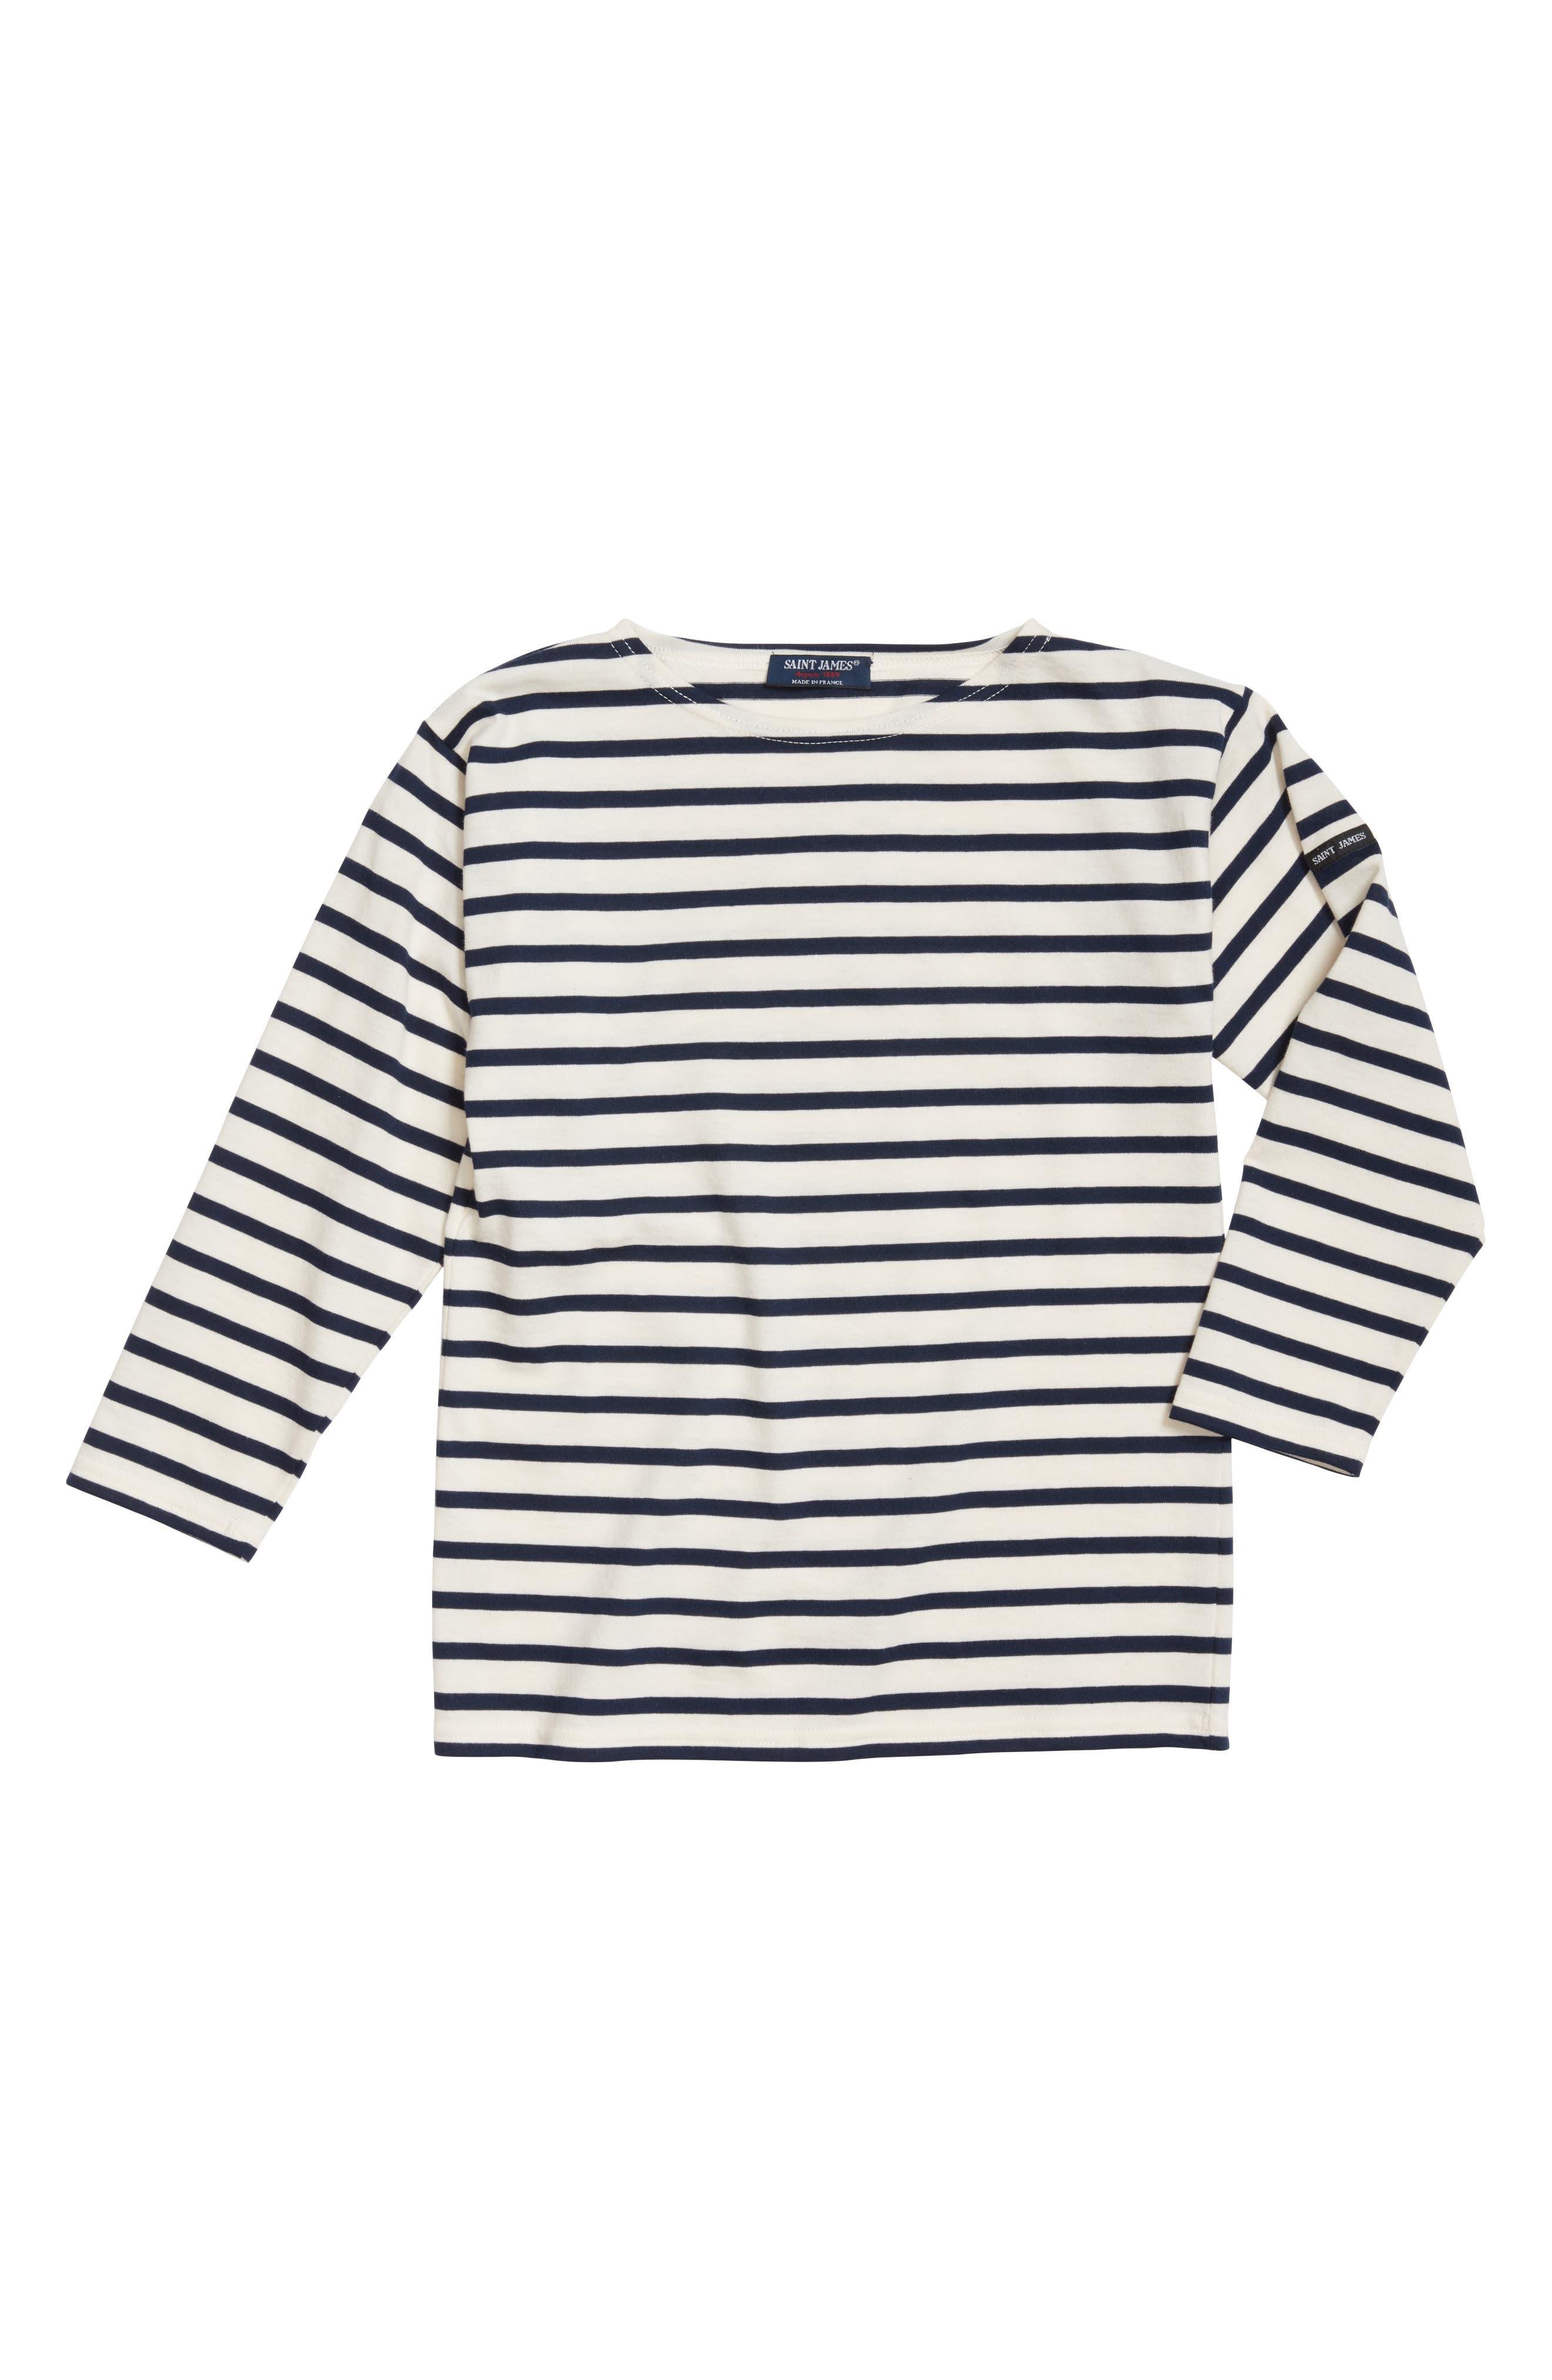 Minquiers Kids Striped Sailor Shirt,                             Main thumbnail 1, color,                             400